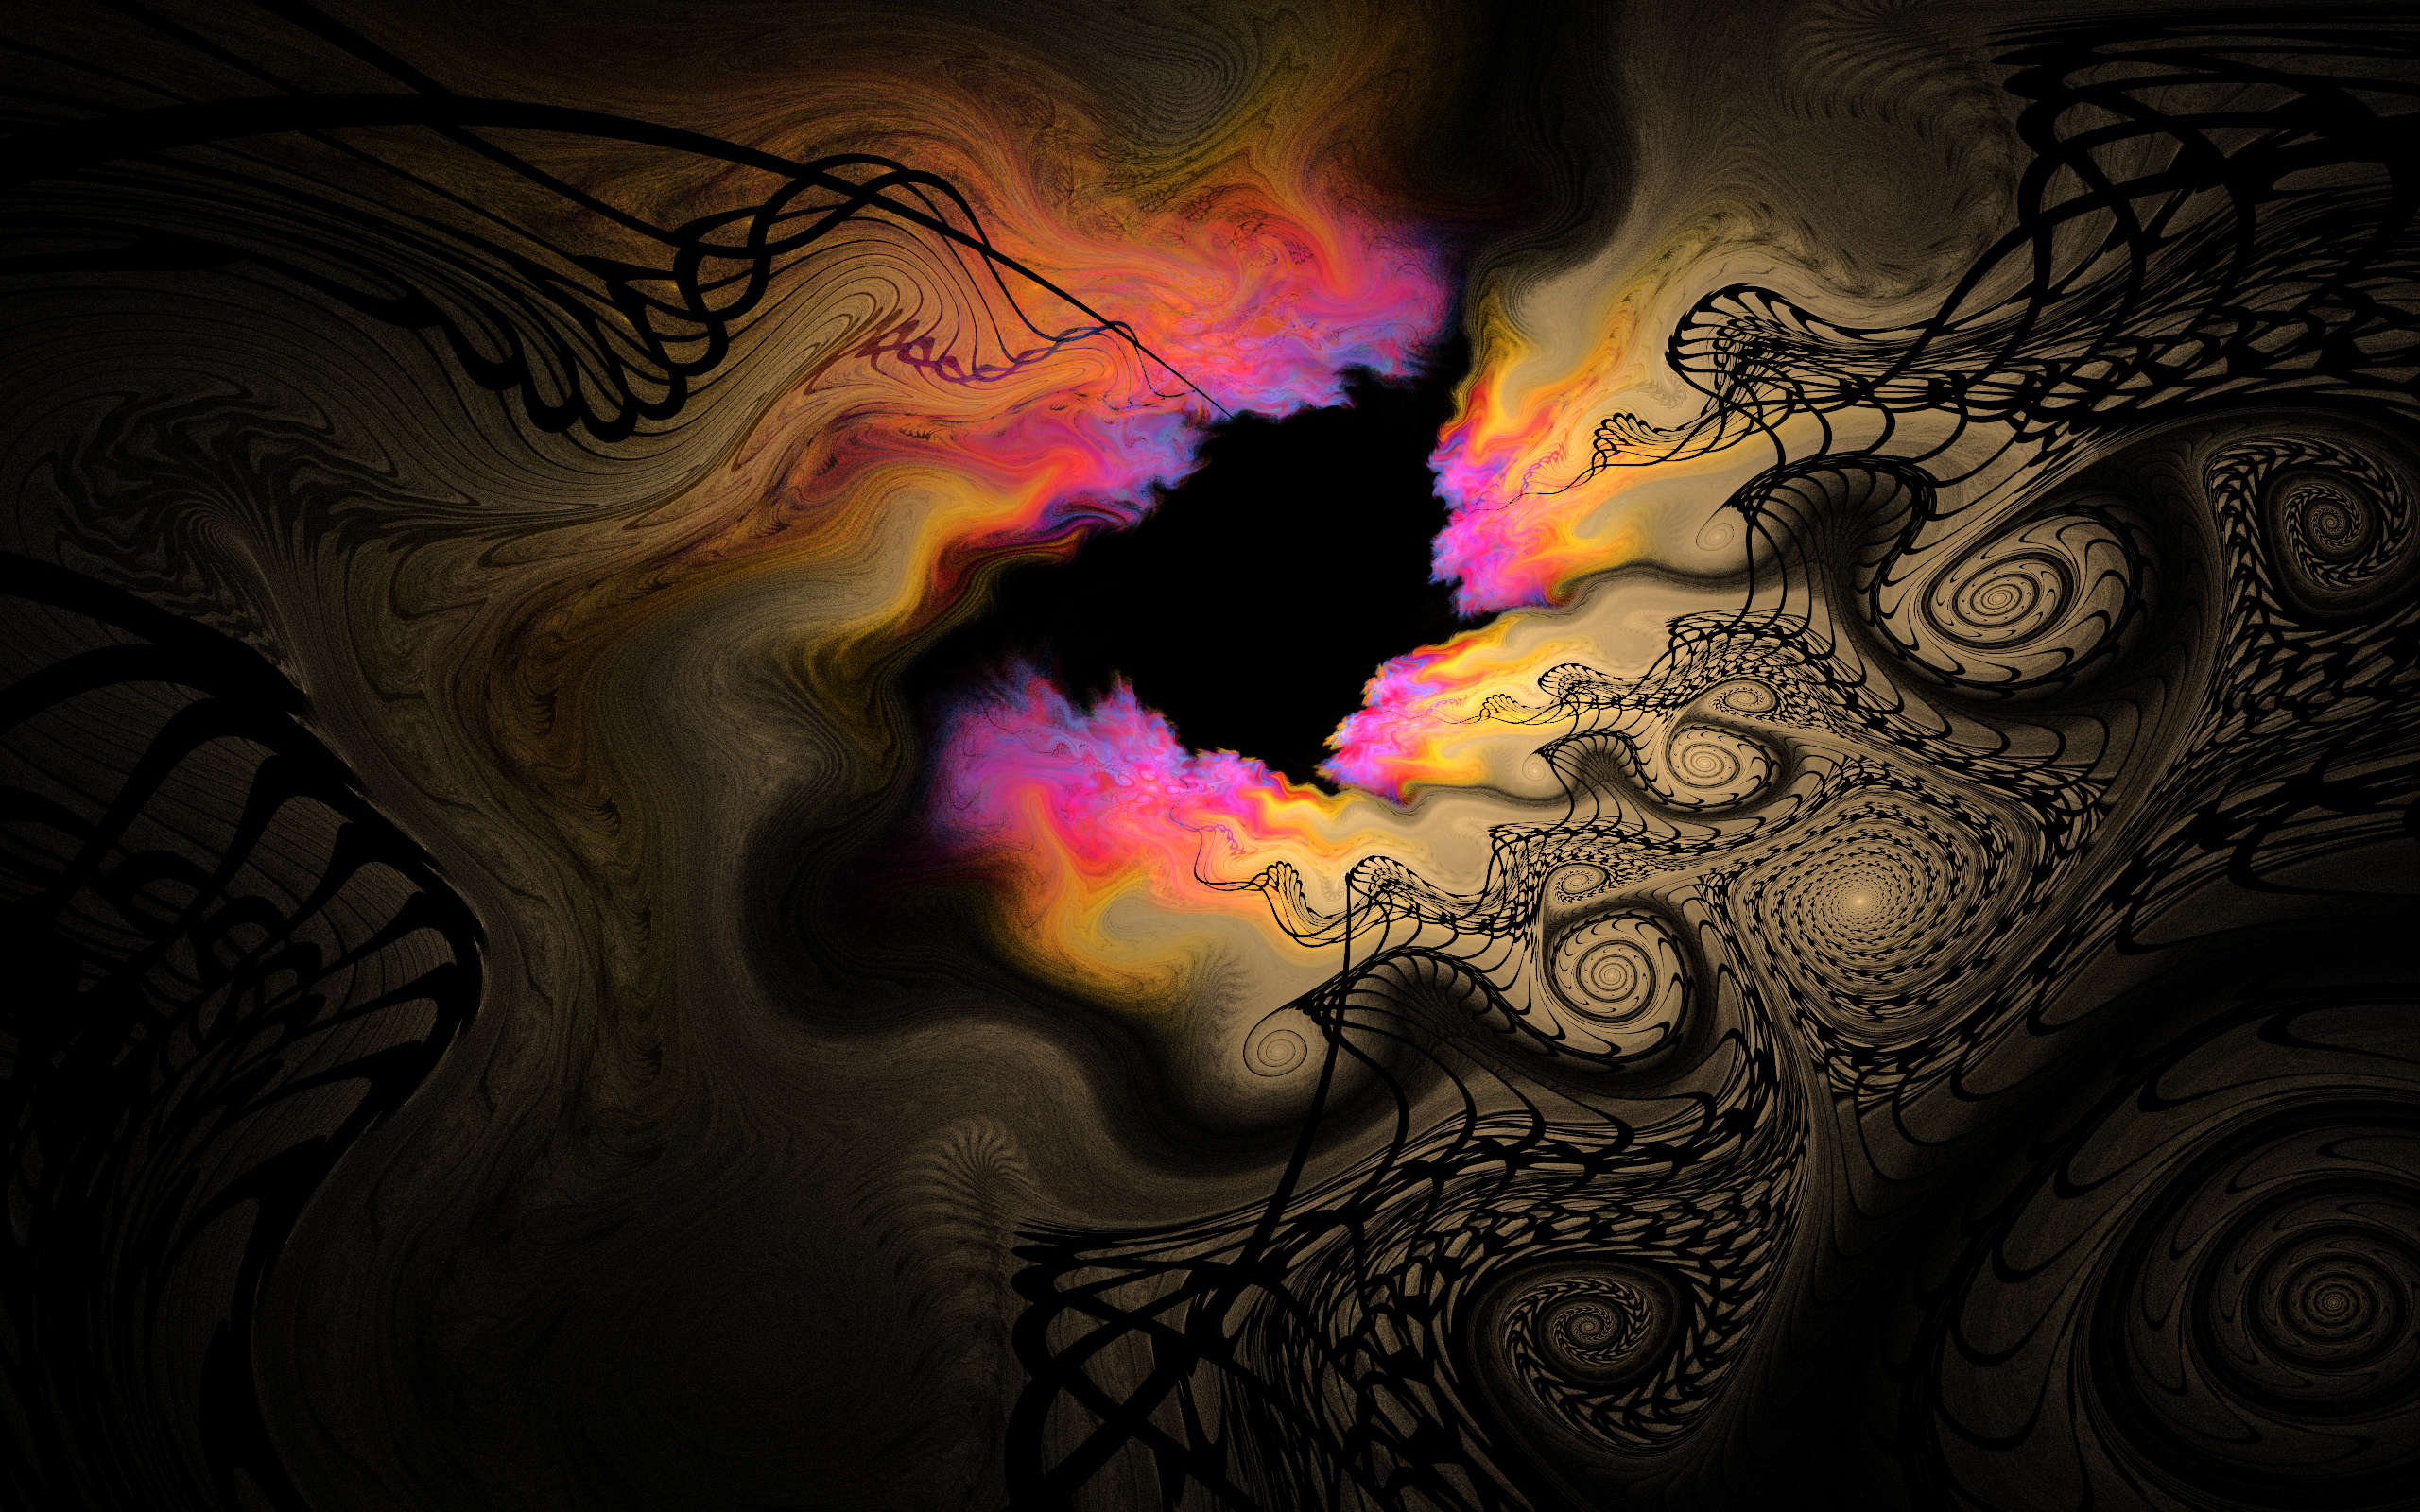 Venusian Storm by riverfox1